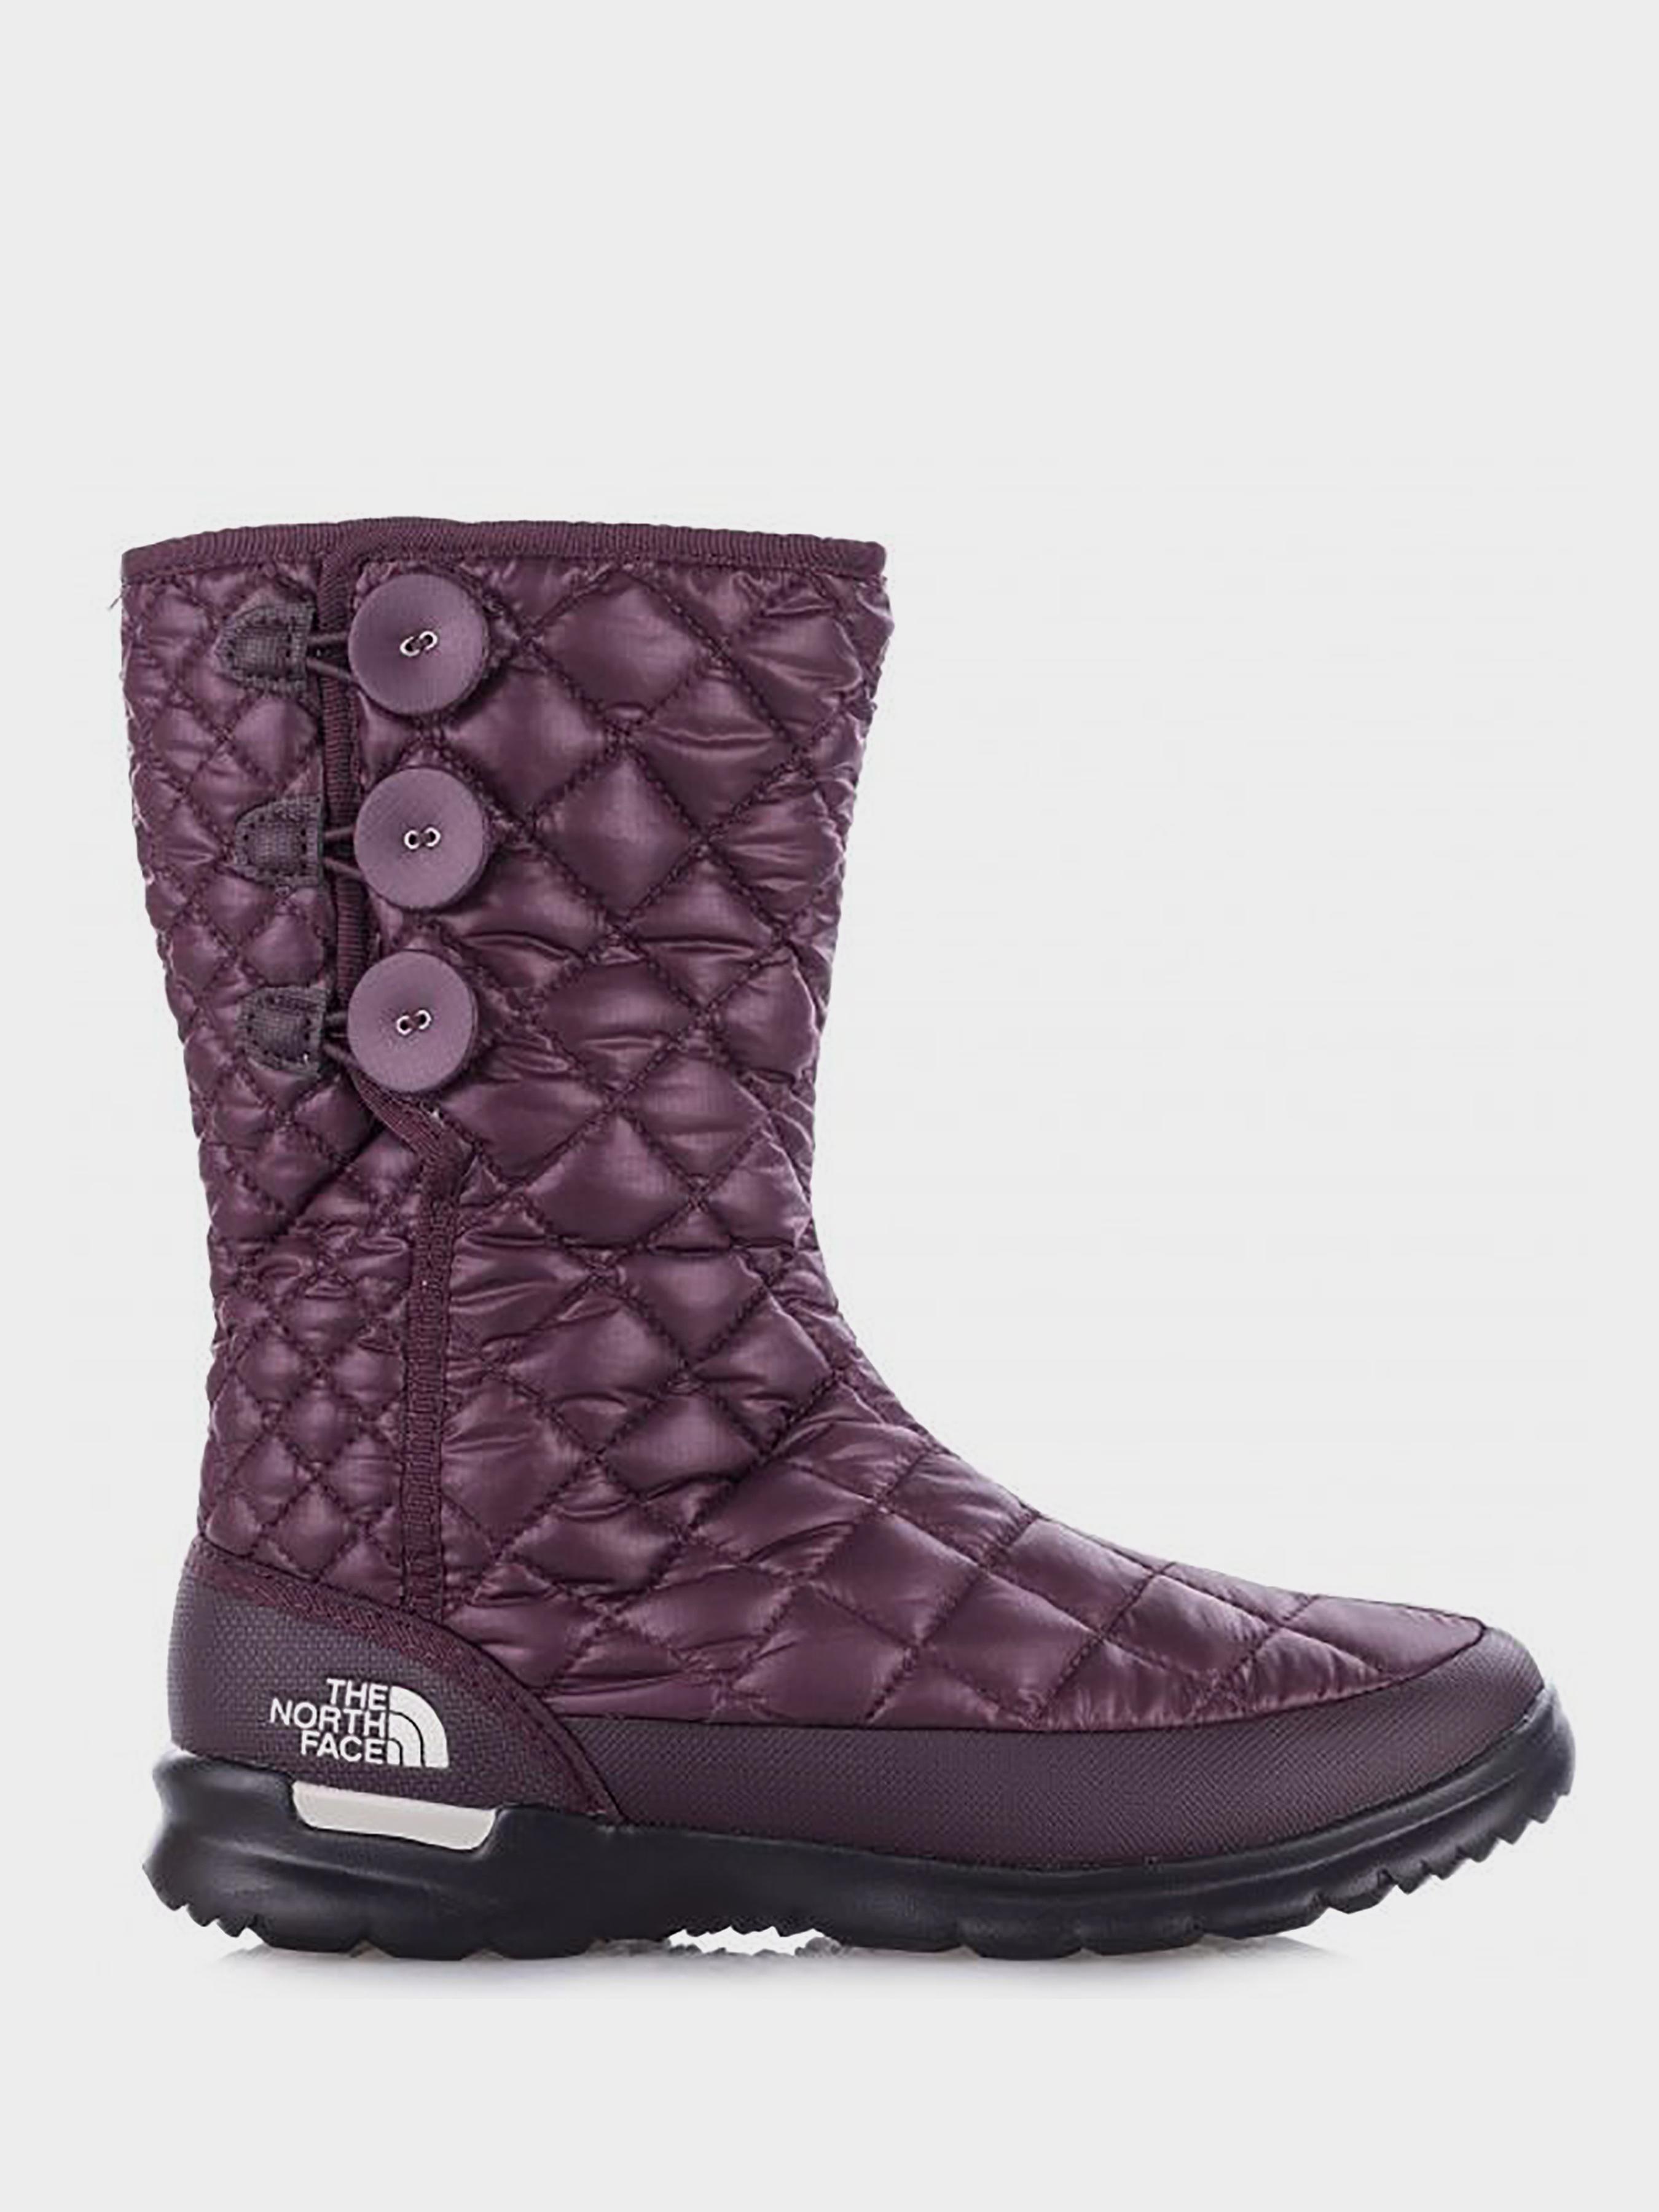 Сапоги для женщин The North Face THRMOBALL BUTTONUP NO9716 продажа, 2017 9114362a16f